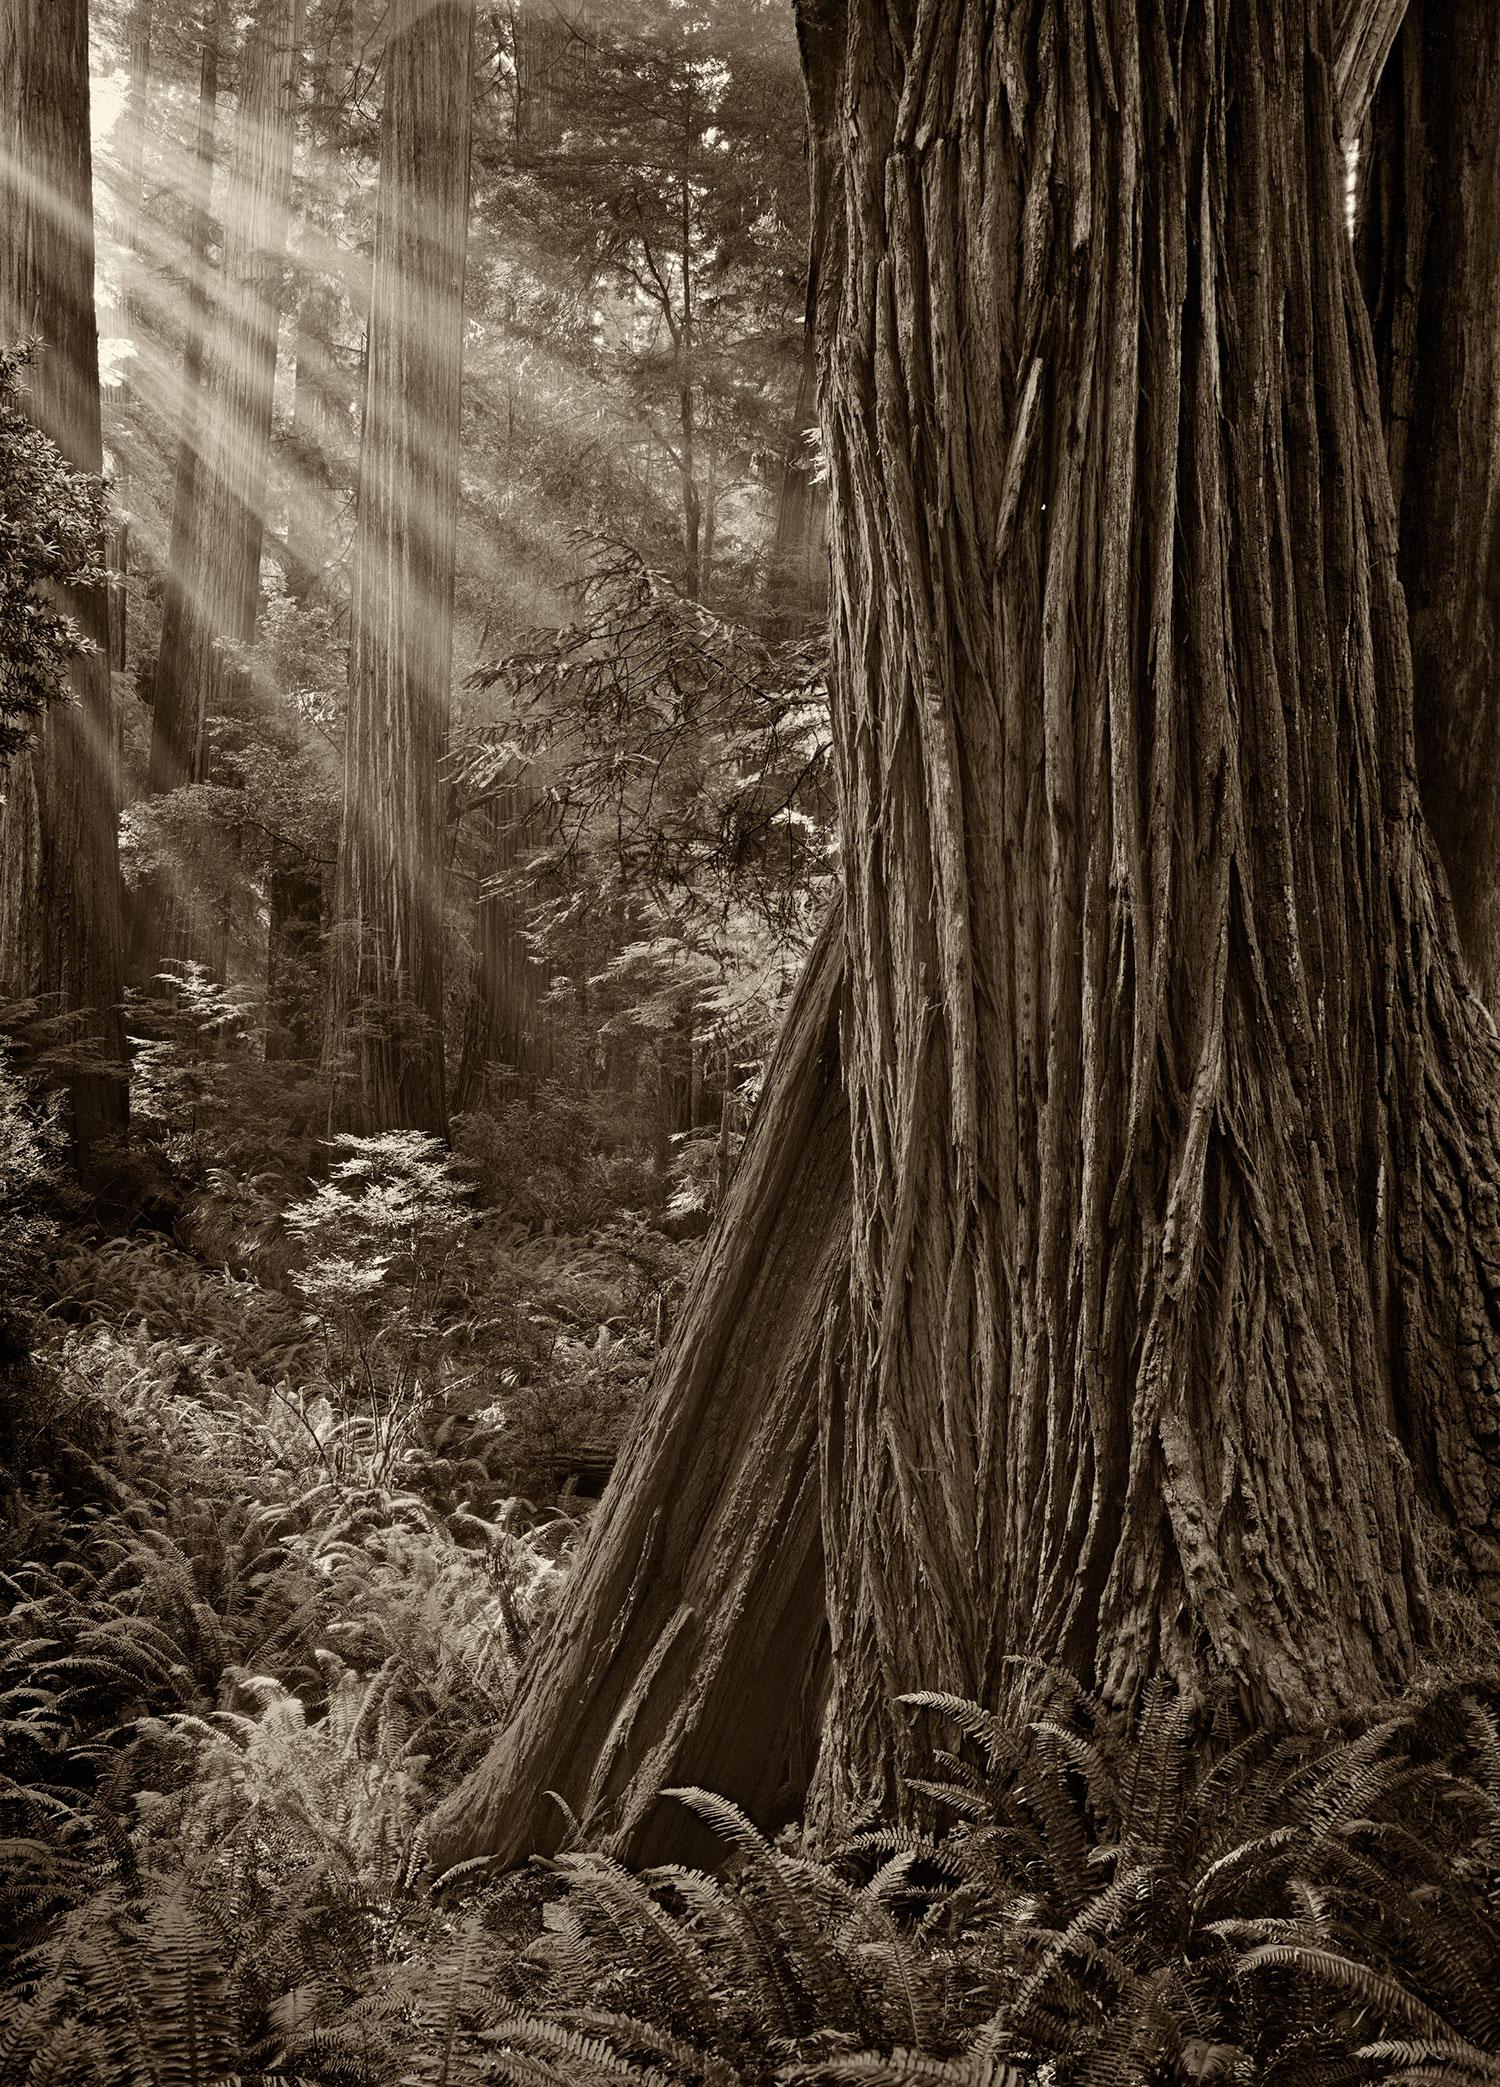 Morning-In-A-Redwood-Grove.jpg